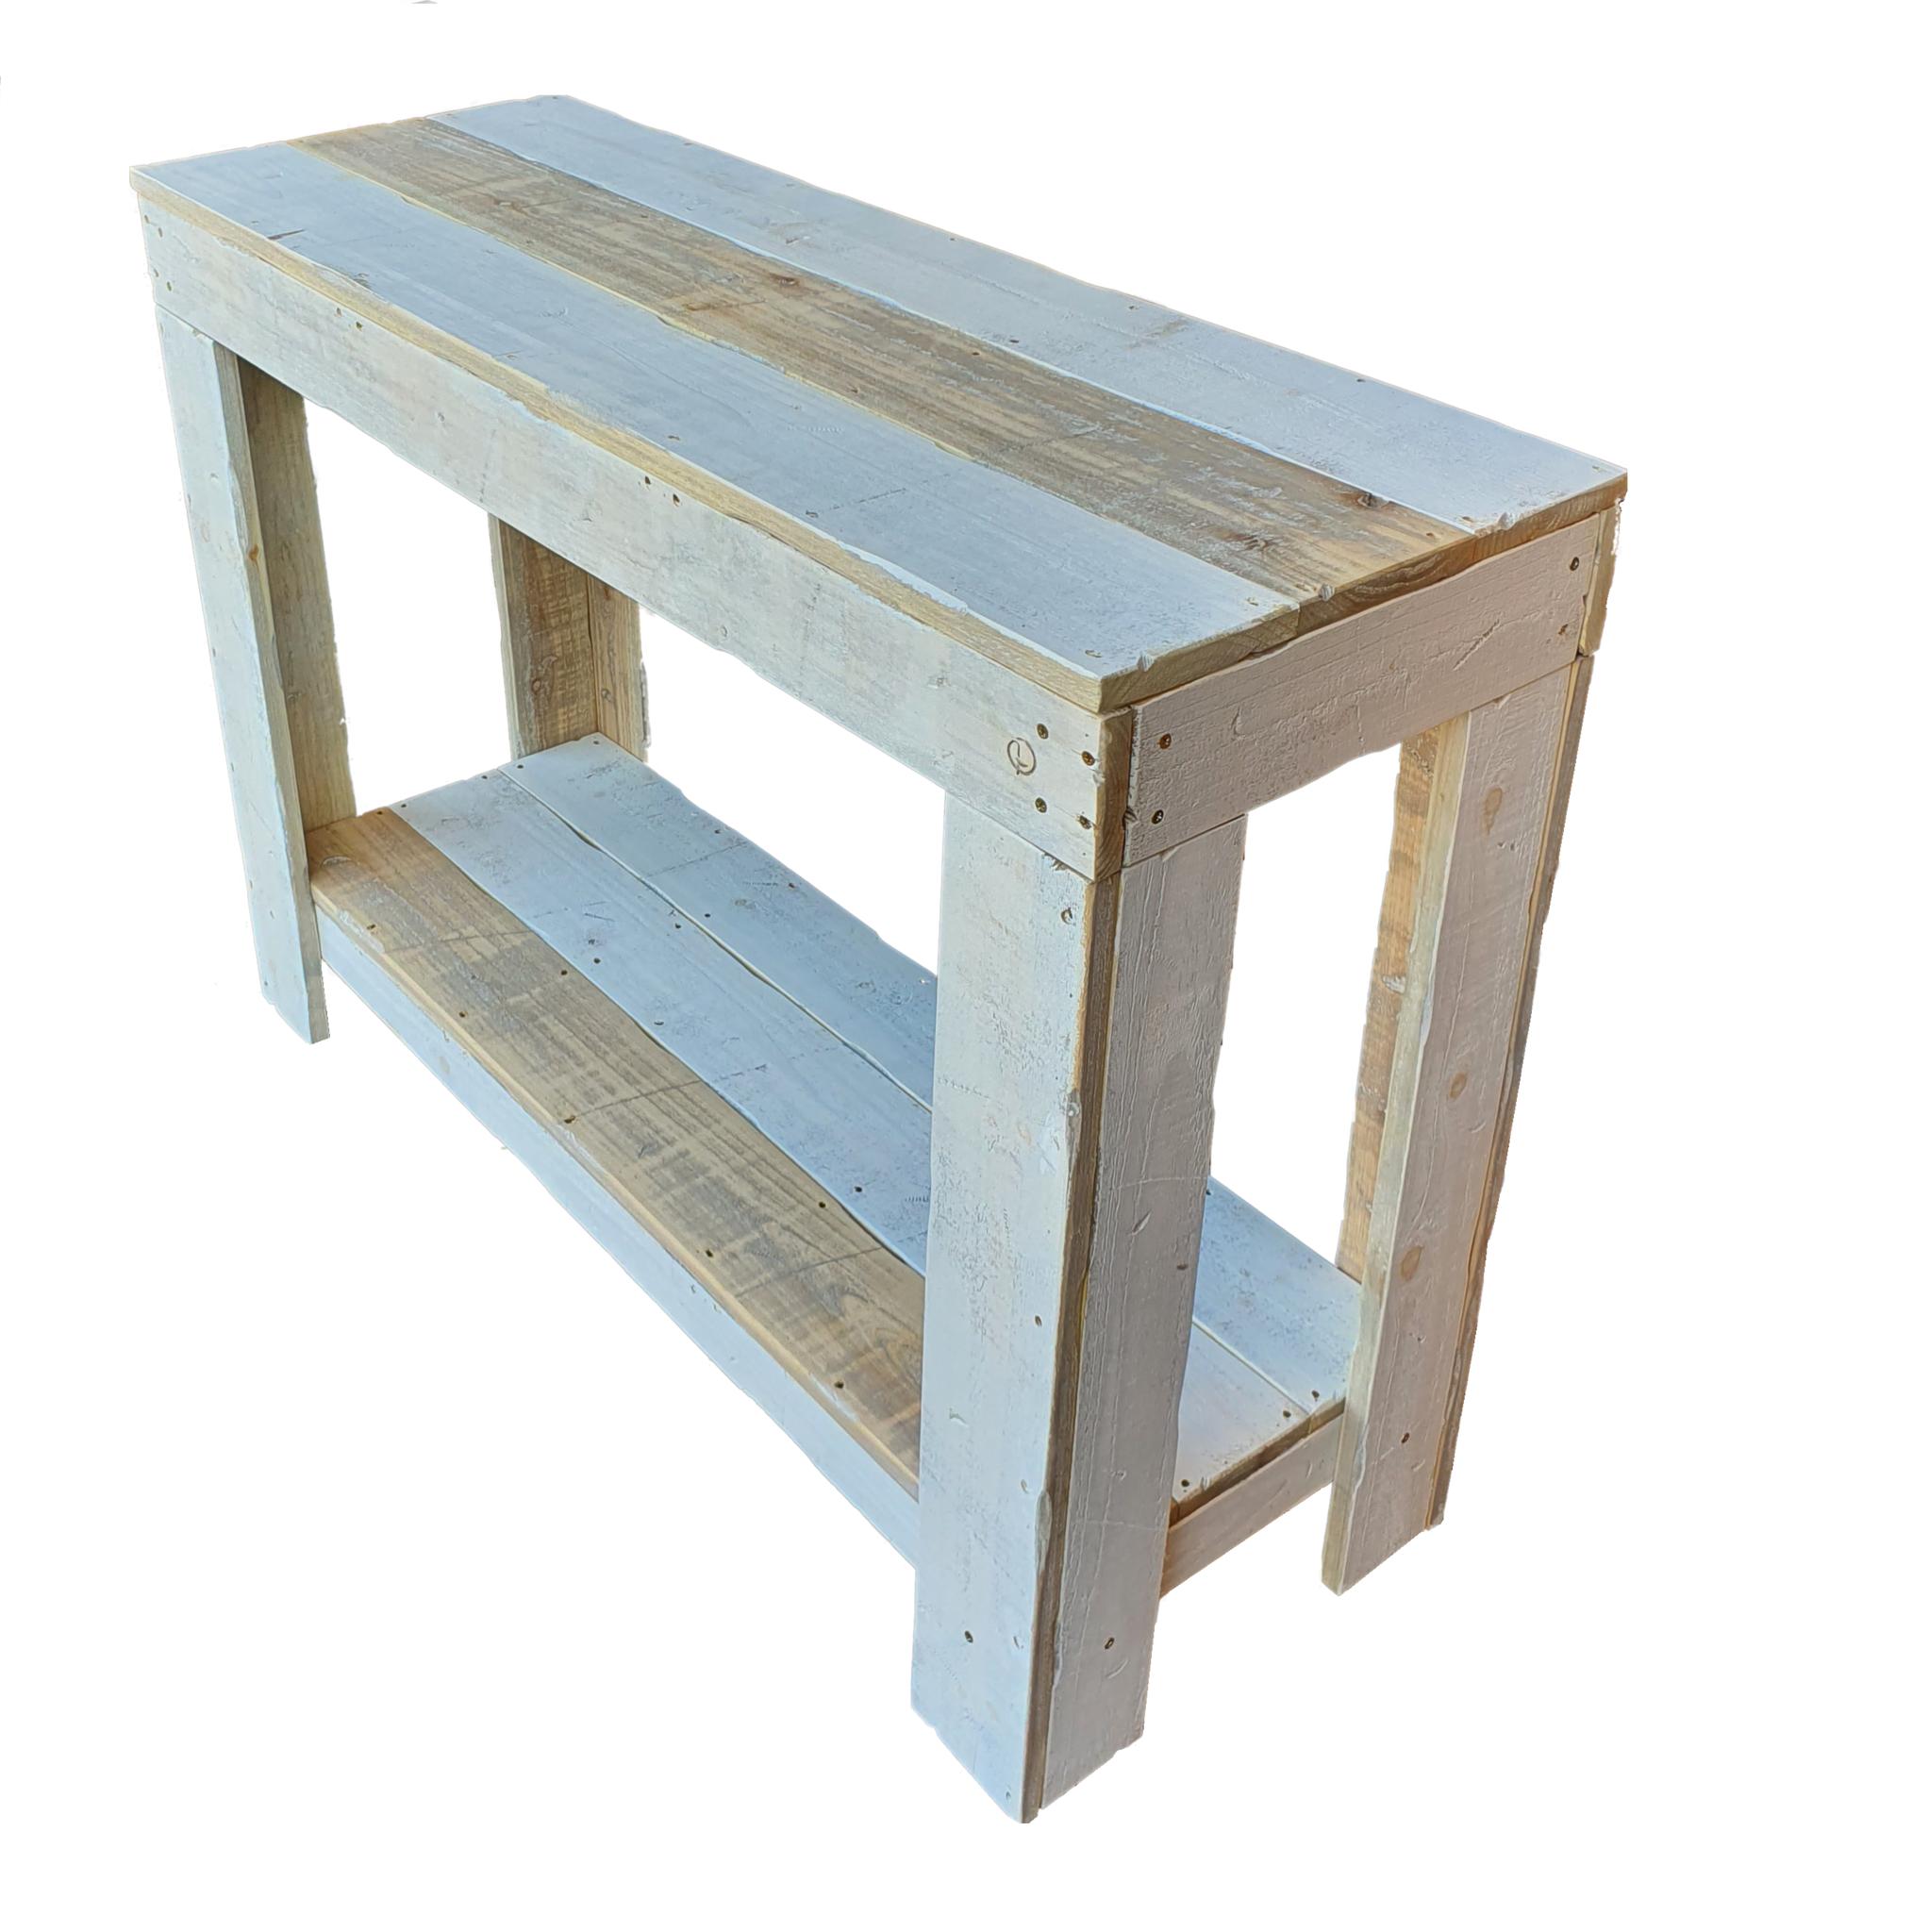 shop int ibiza white table double 110/39-3